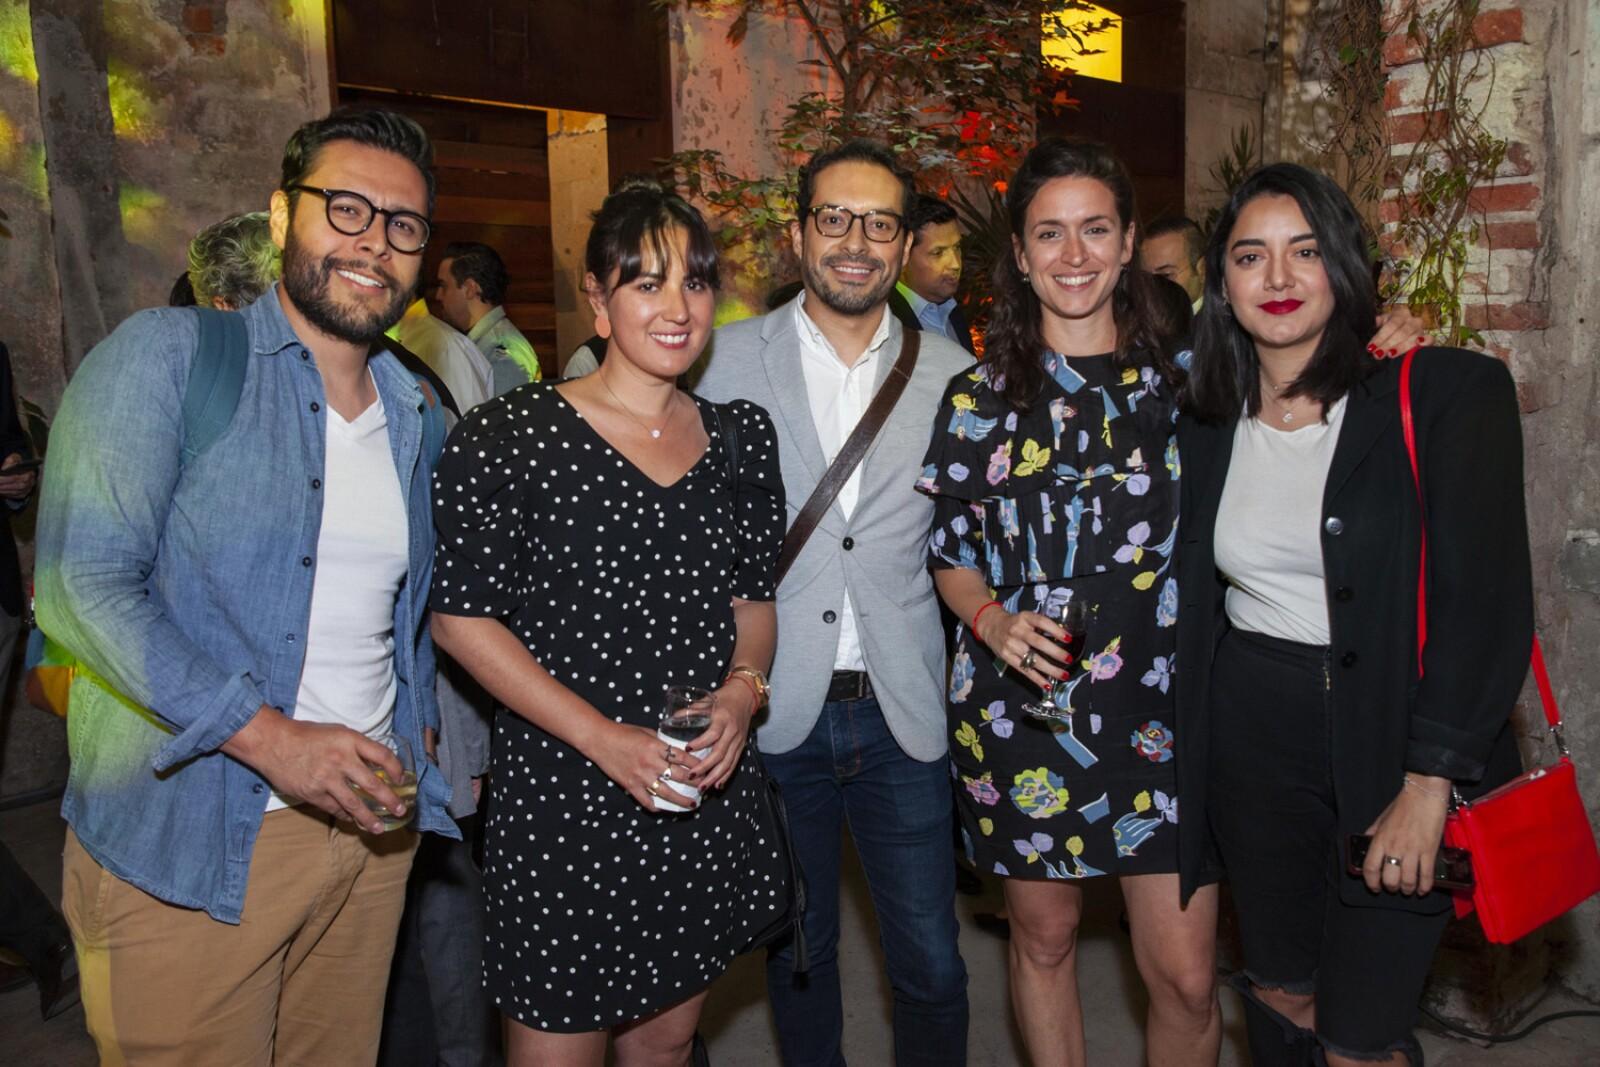 Cesar Magallanes, Estefania Araiza, Omar Cruz Garcia, Tai la bella damsky, Abigail Quesnel